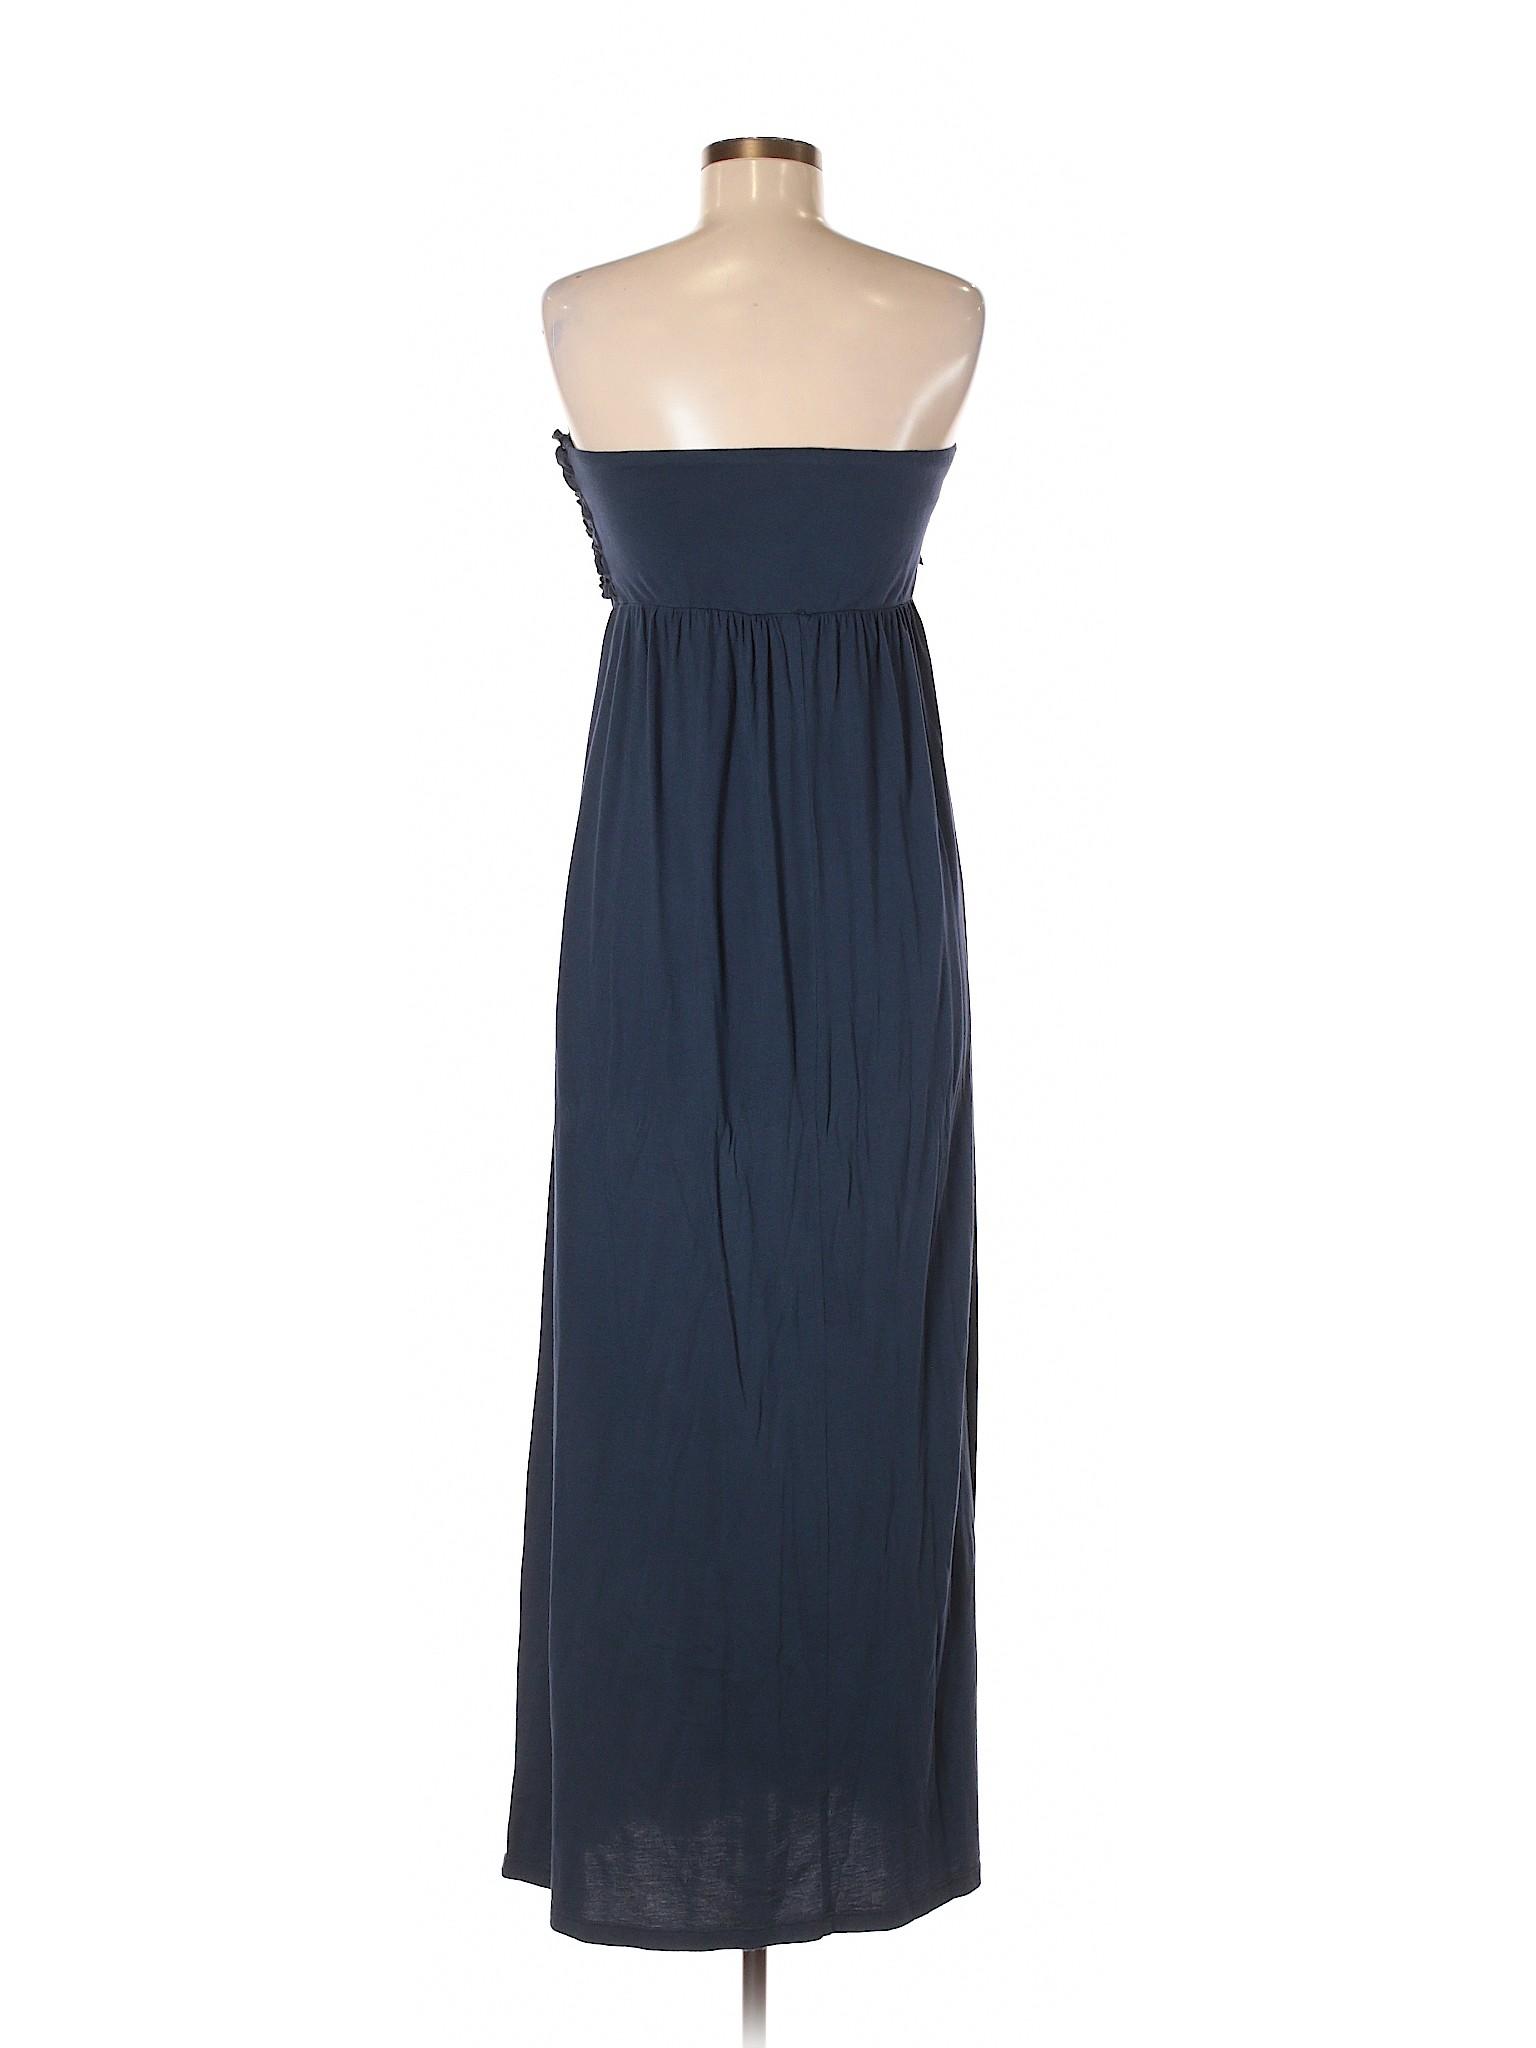 Allen Allen Dress Boutique Casual winter 4w5qcc6TBE